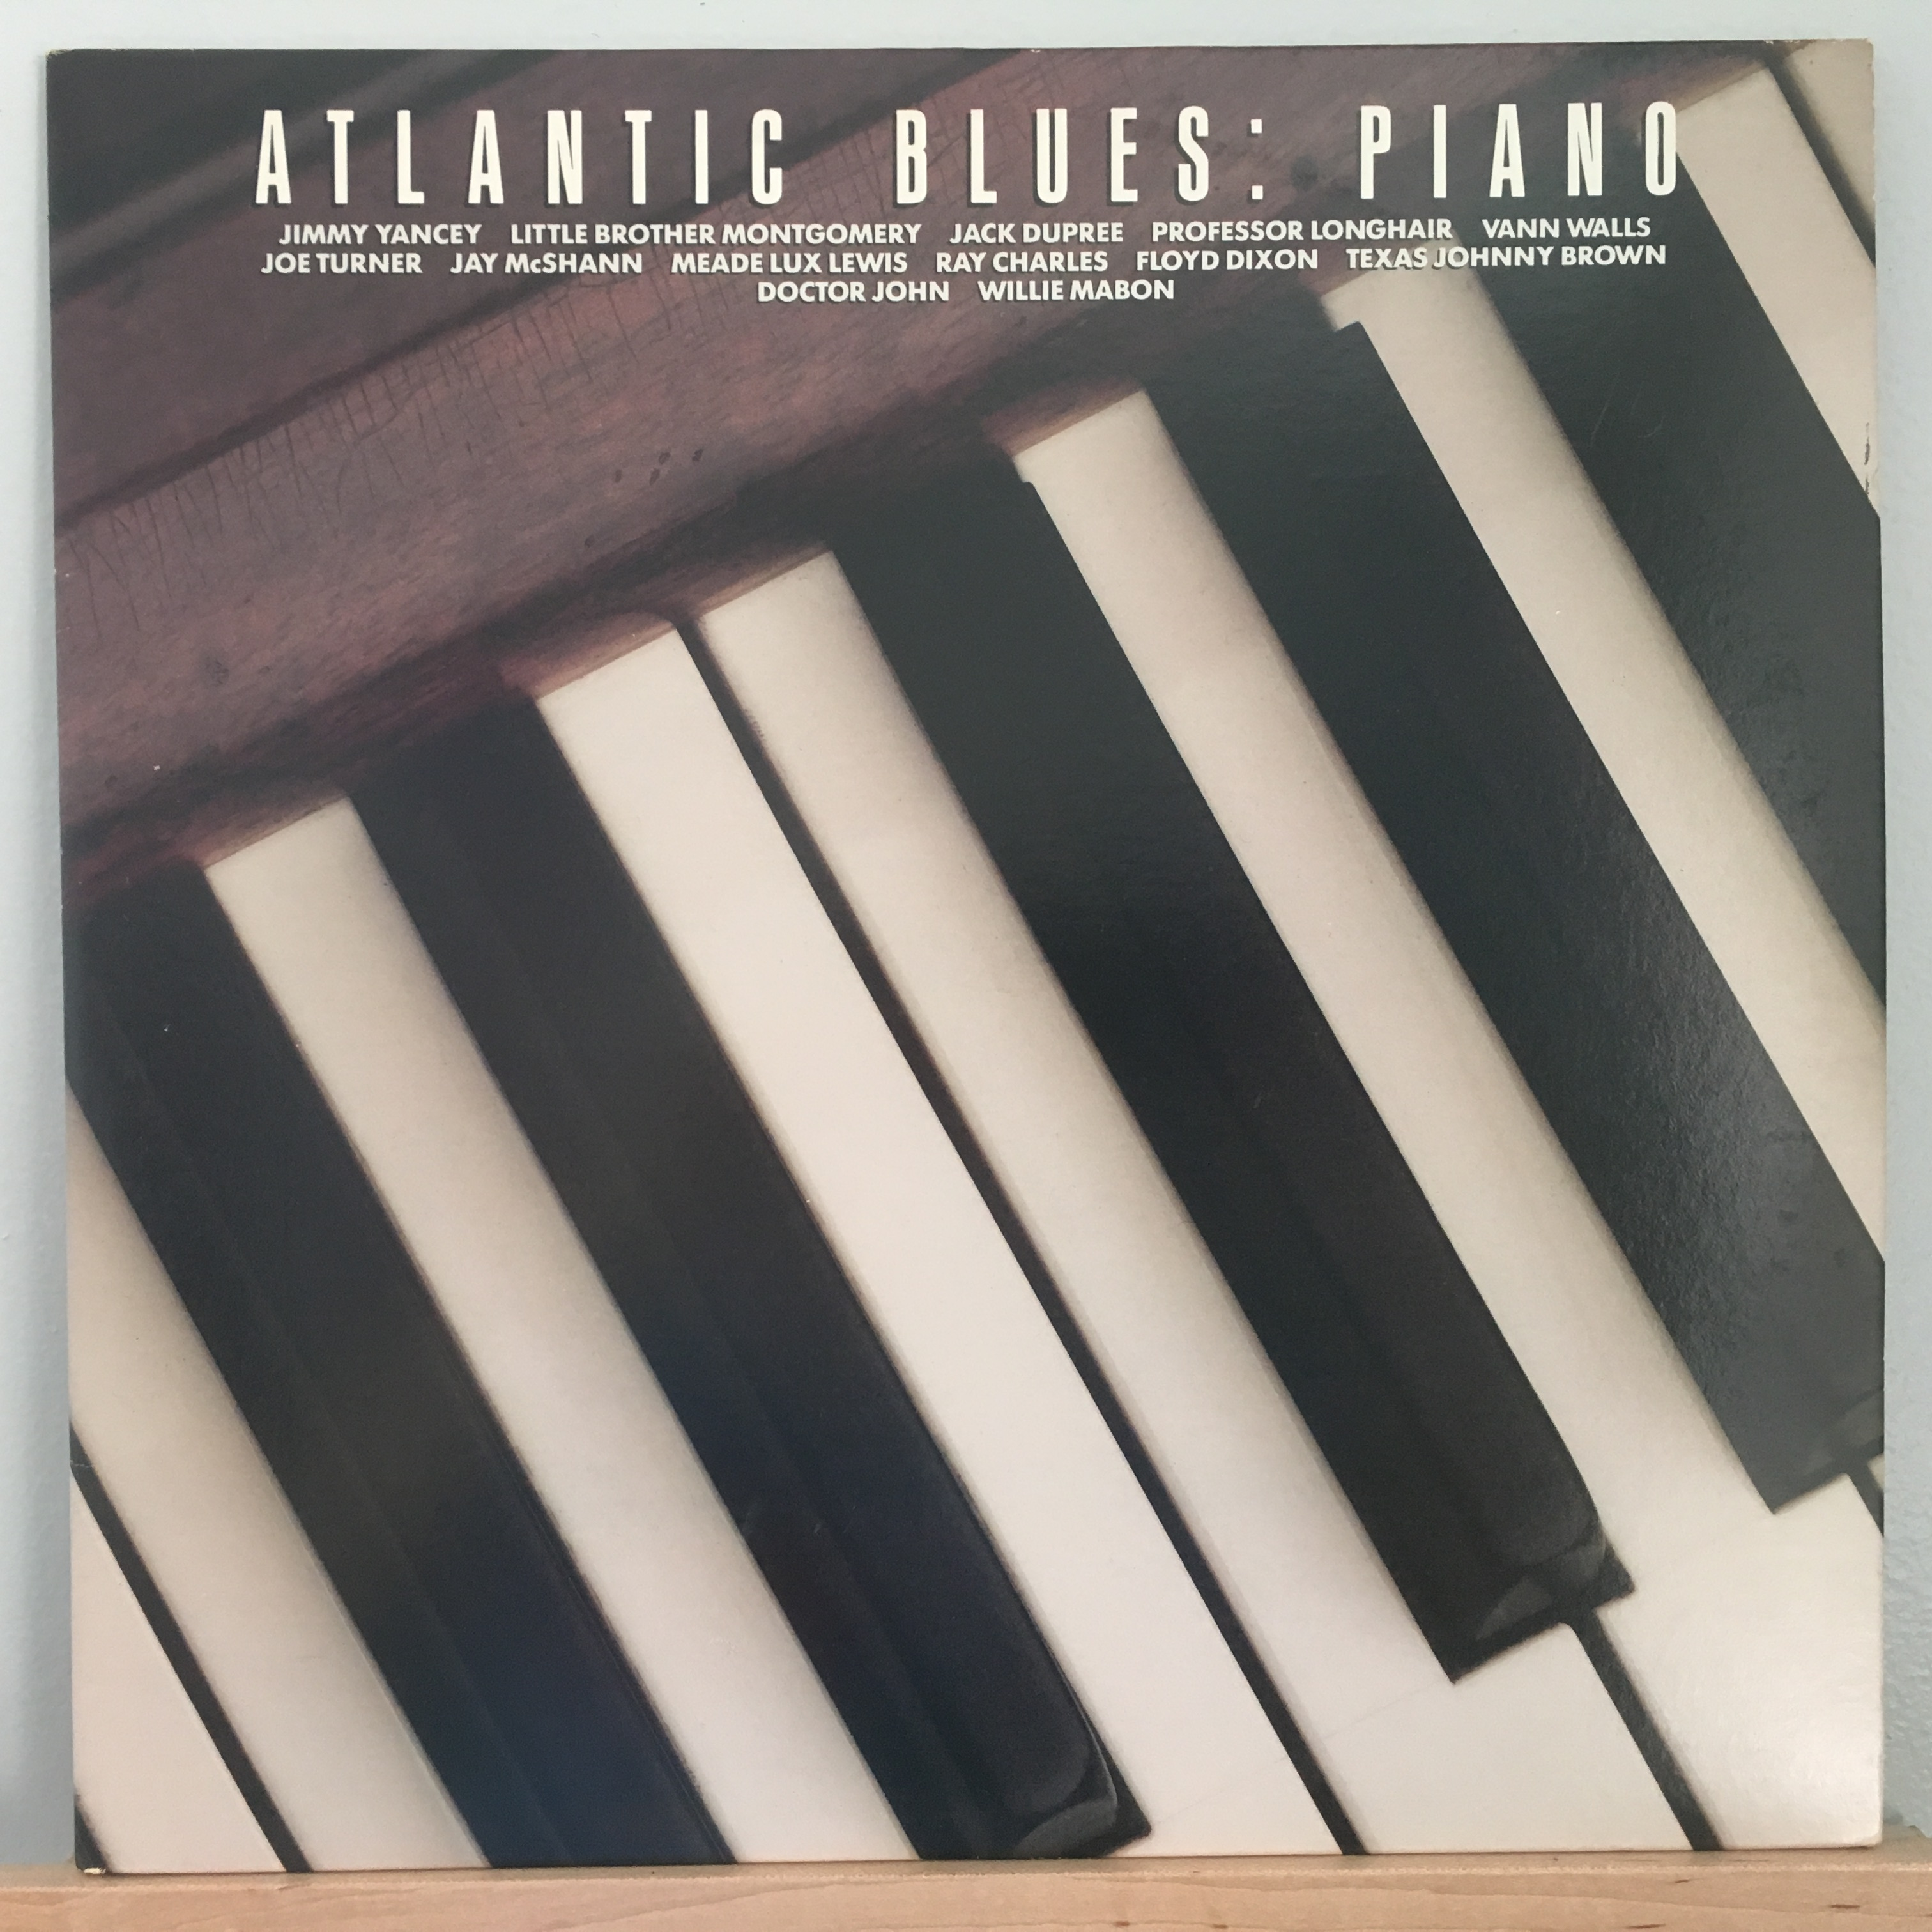 Atlantic Blues: Piano front cover